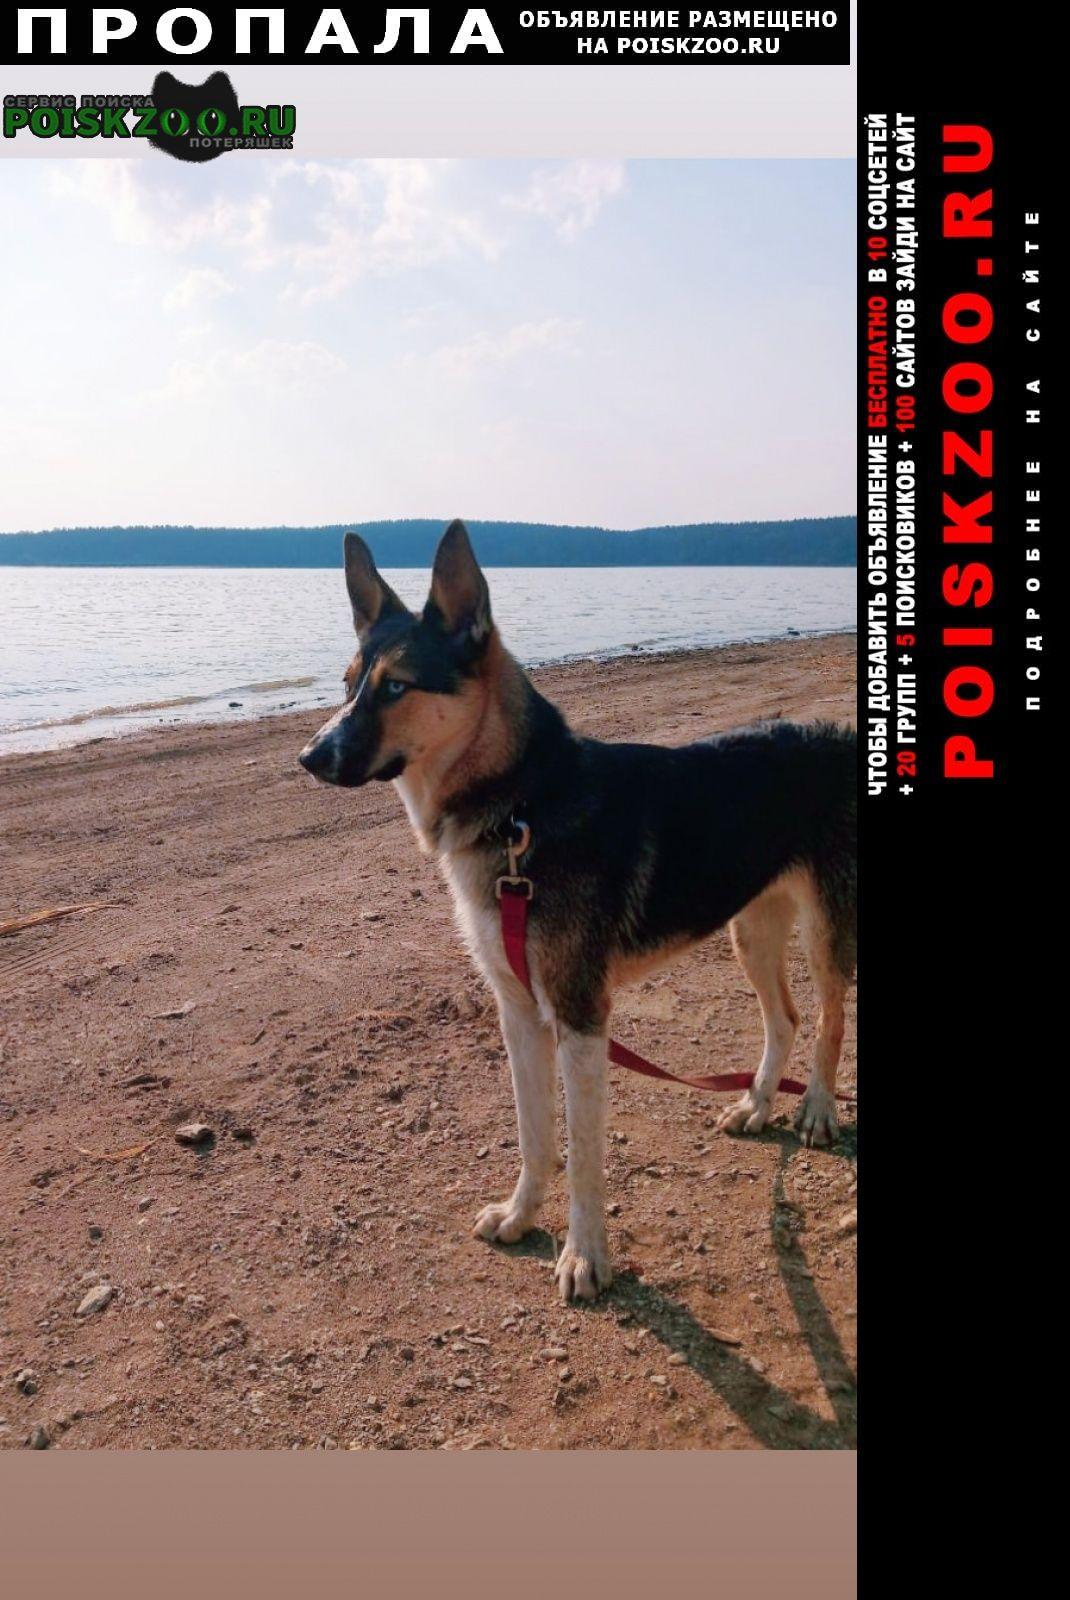 Пропала собака район виз Екатеринбург